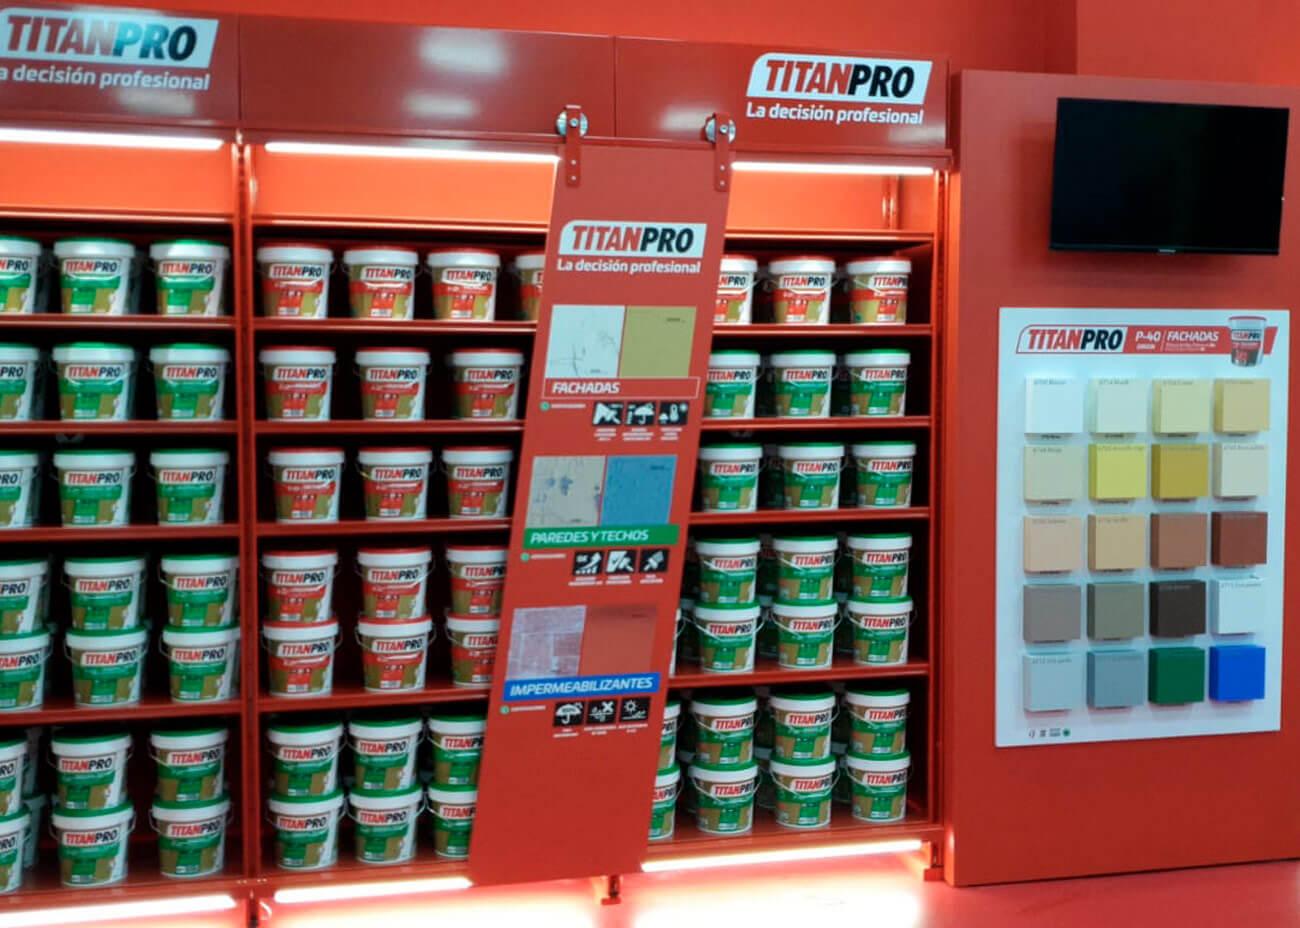 titanpro-img09-caad-retail-design-barcelona